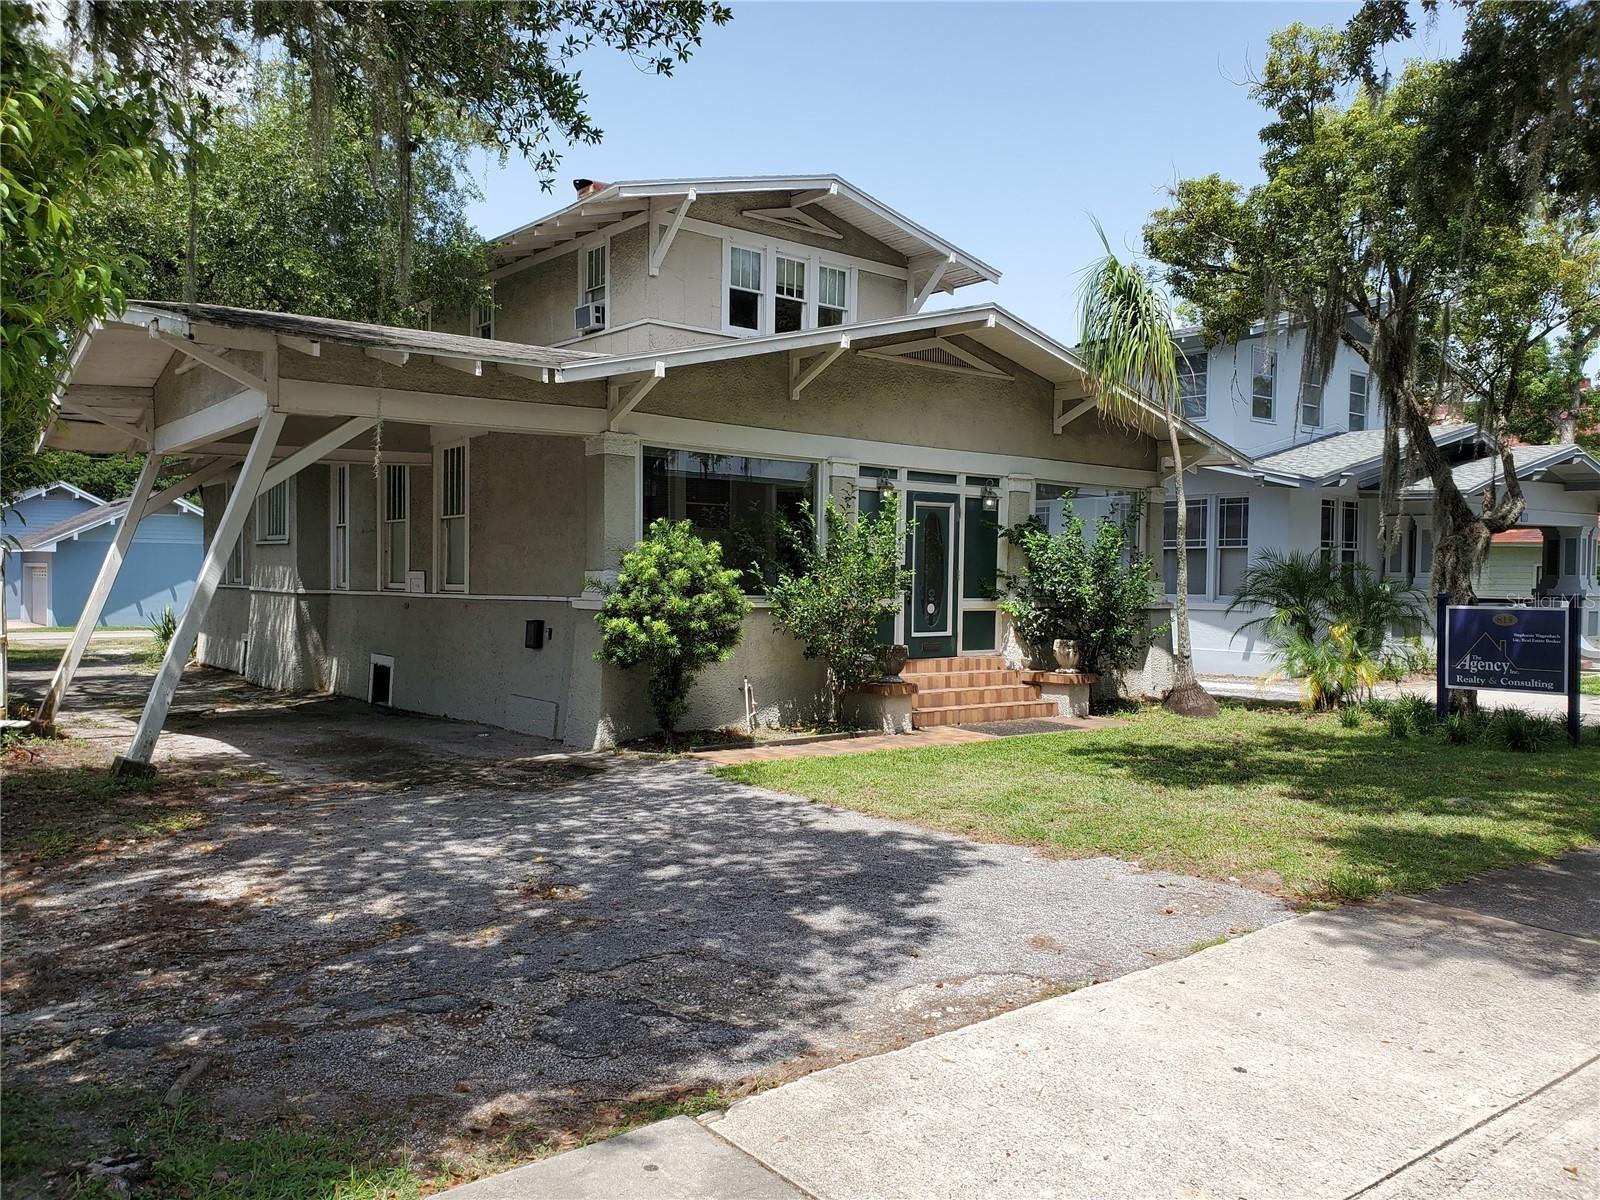 815 S MISSOURI AVENUE, Lakeland, FL 33815 - #: L4925021